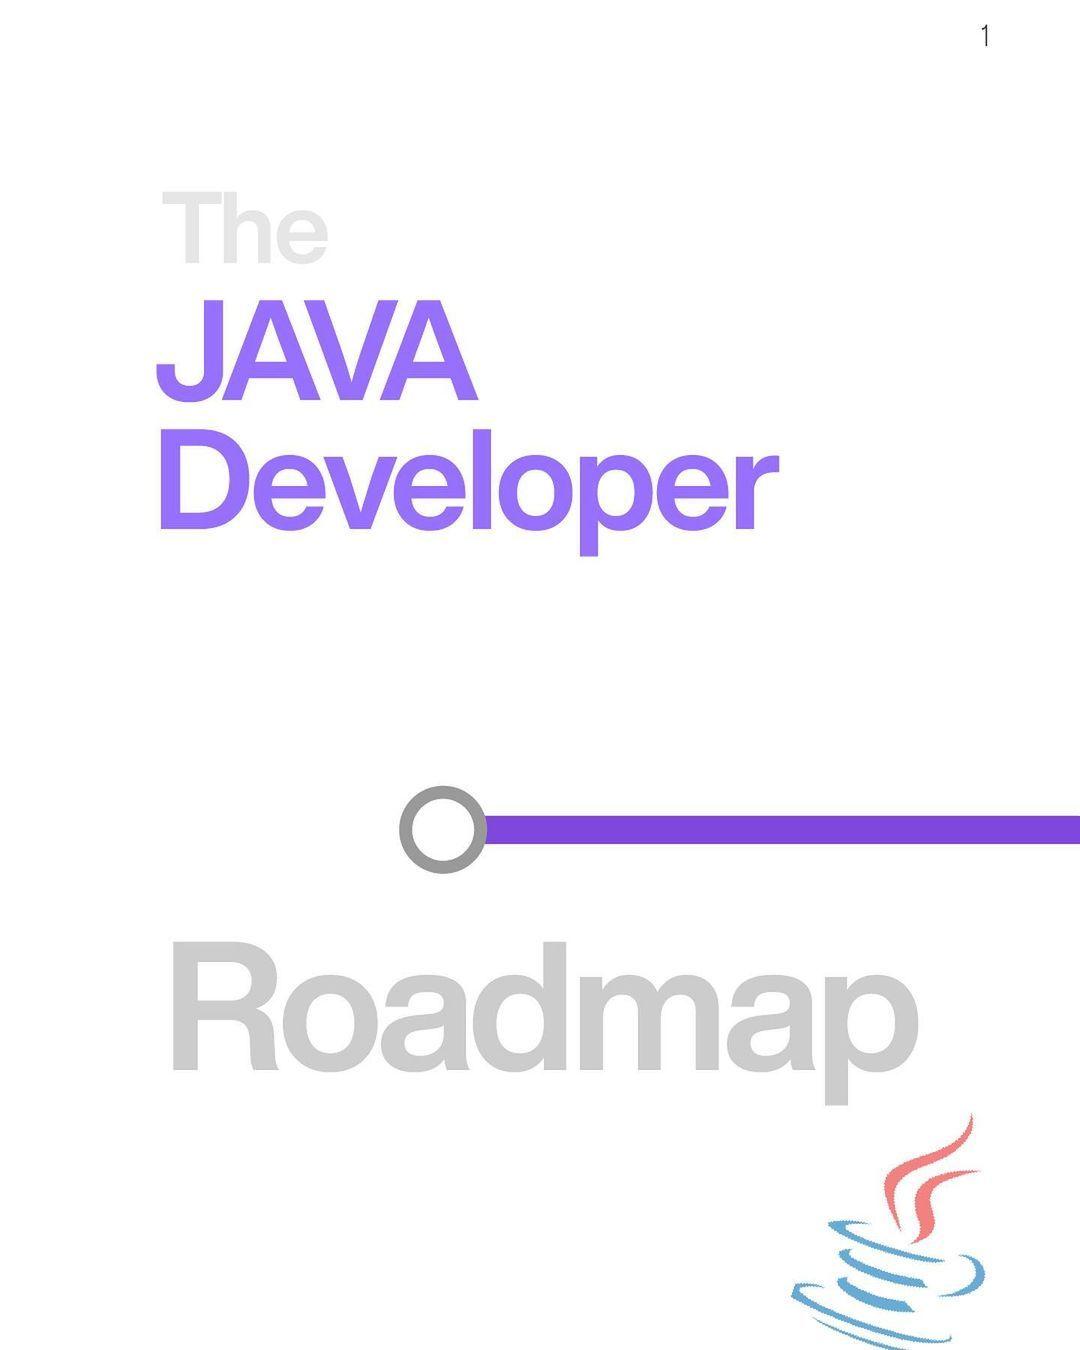 The java developer